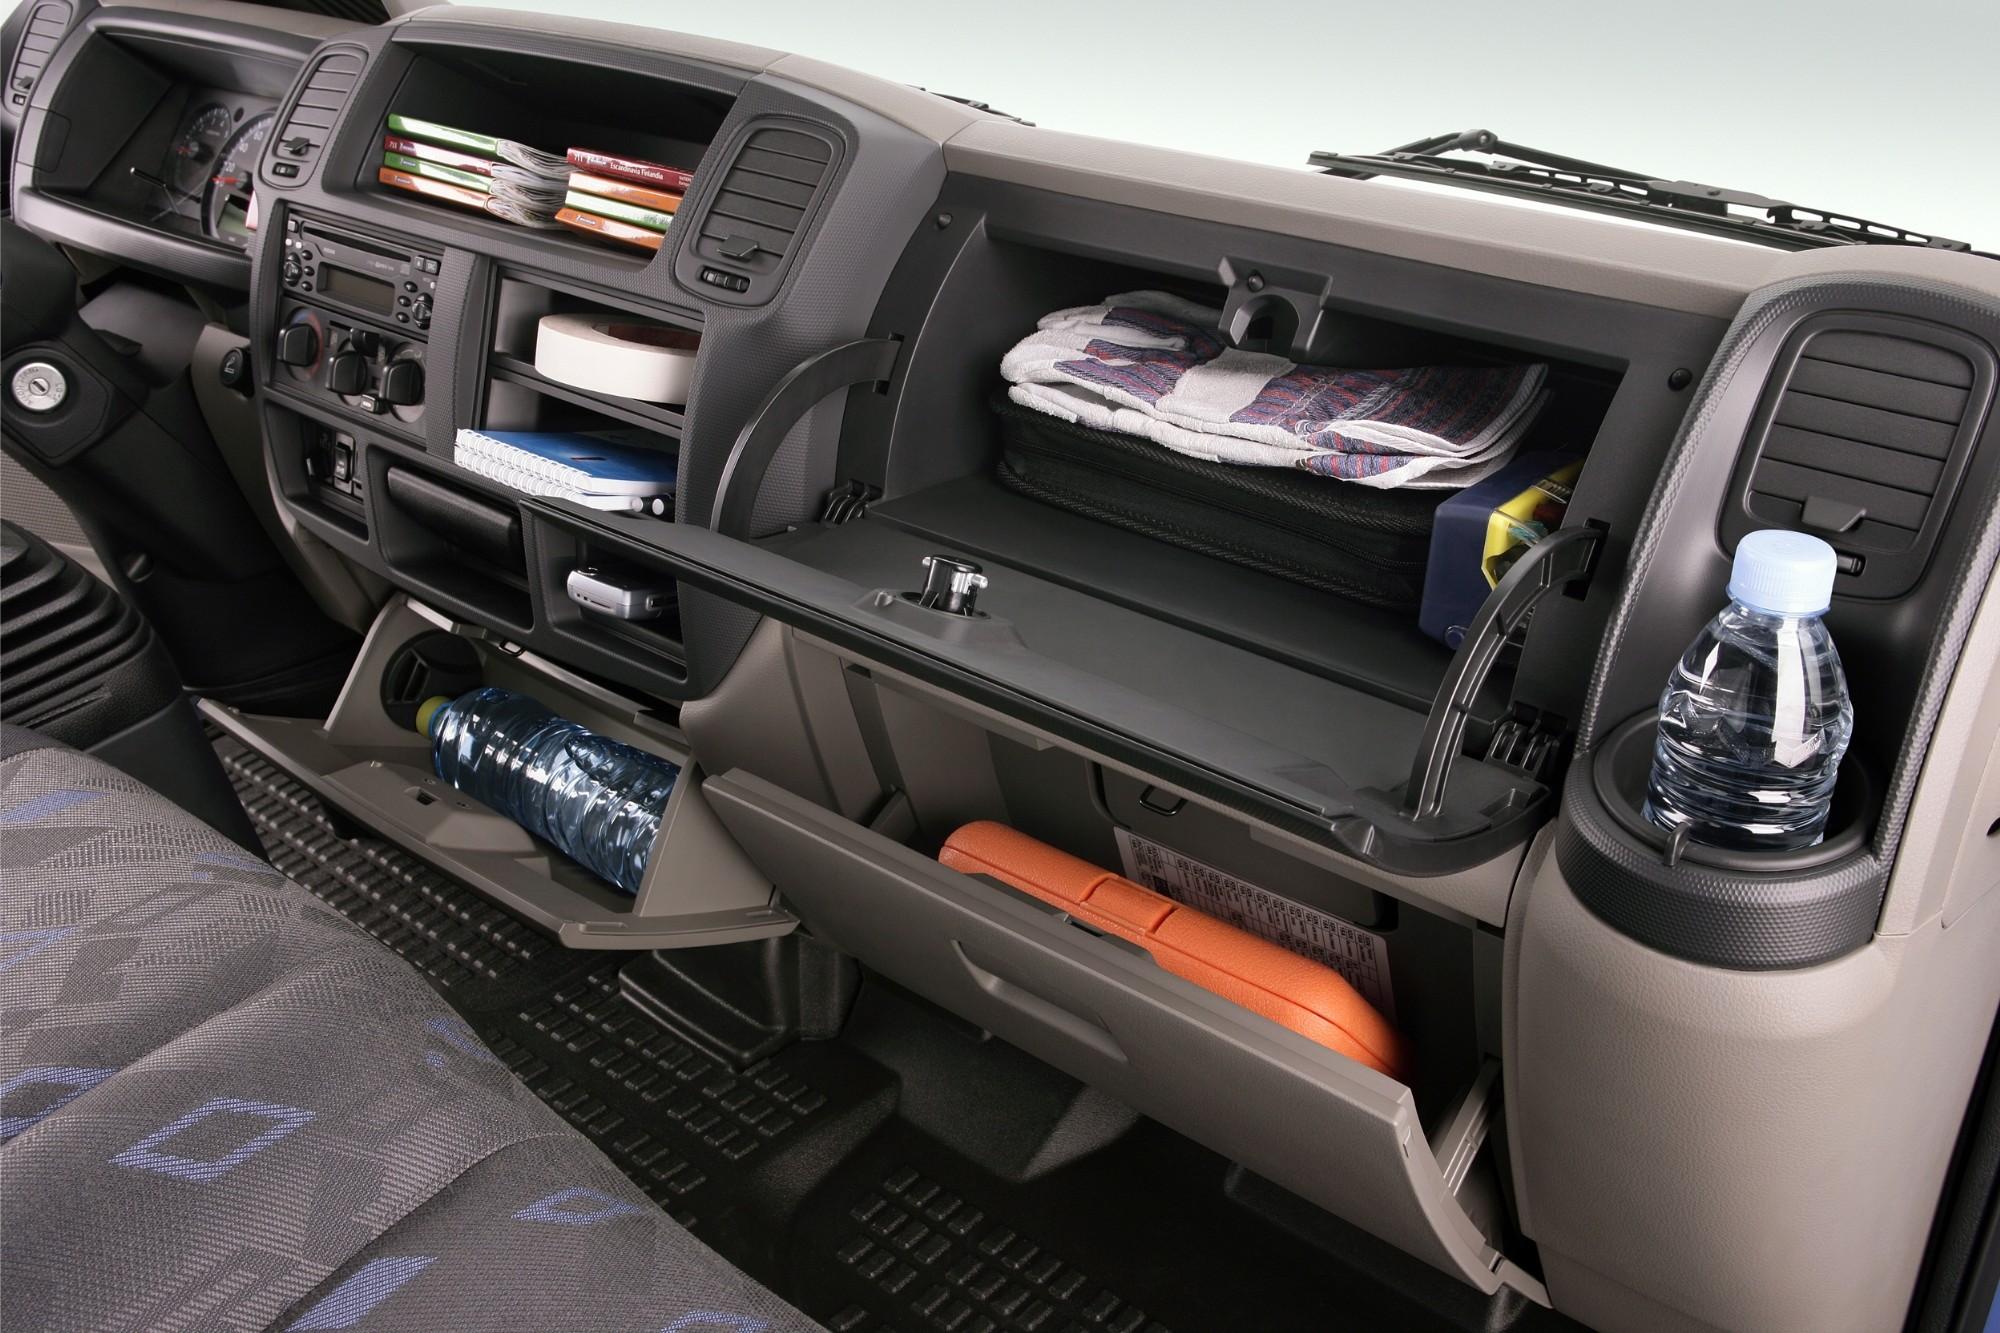 Schema Elettrico Nissan Cabstar : Vul nissan cabstar la fiche technique